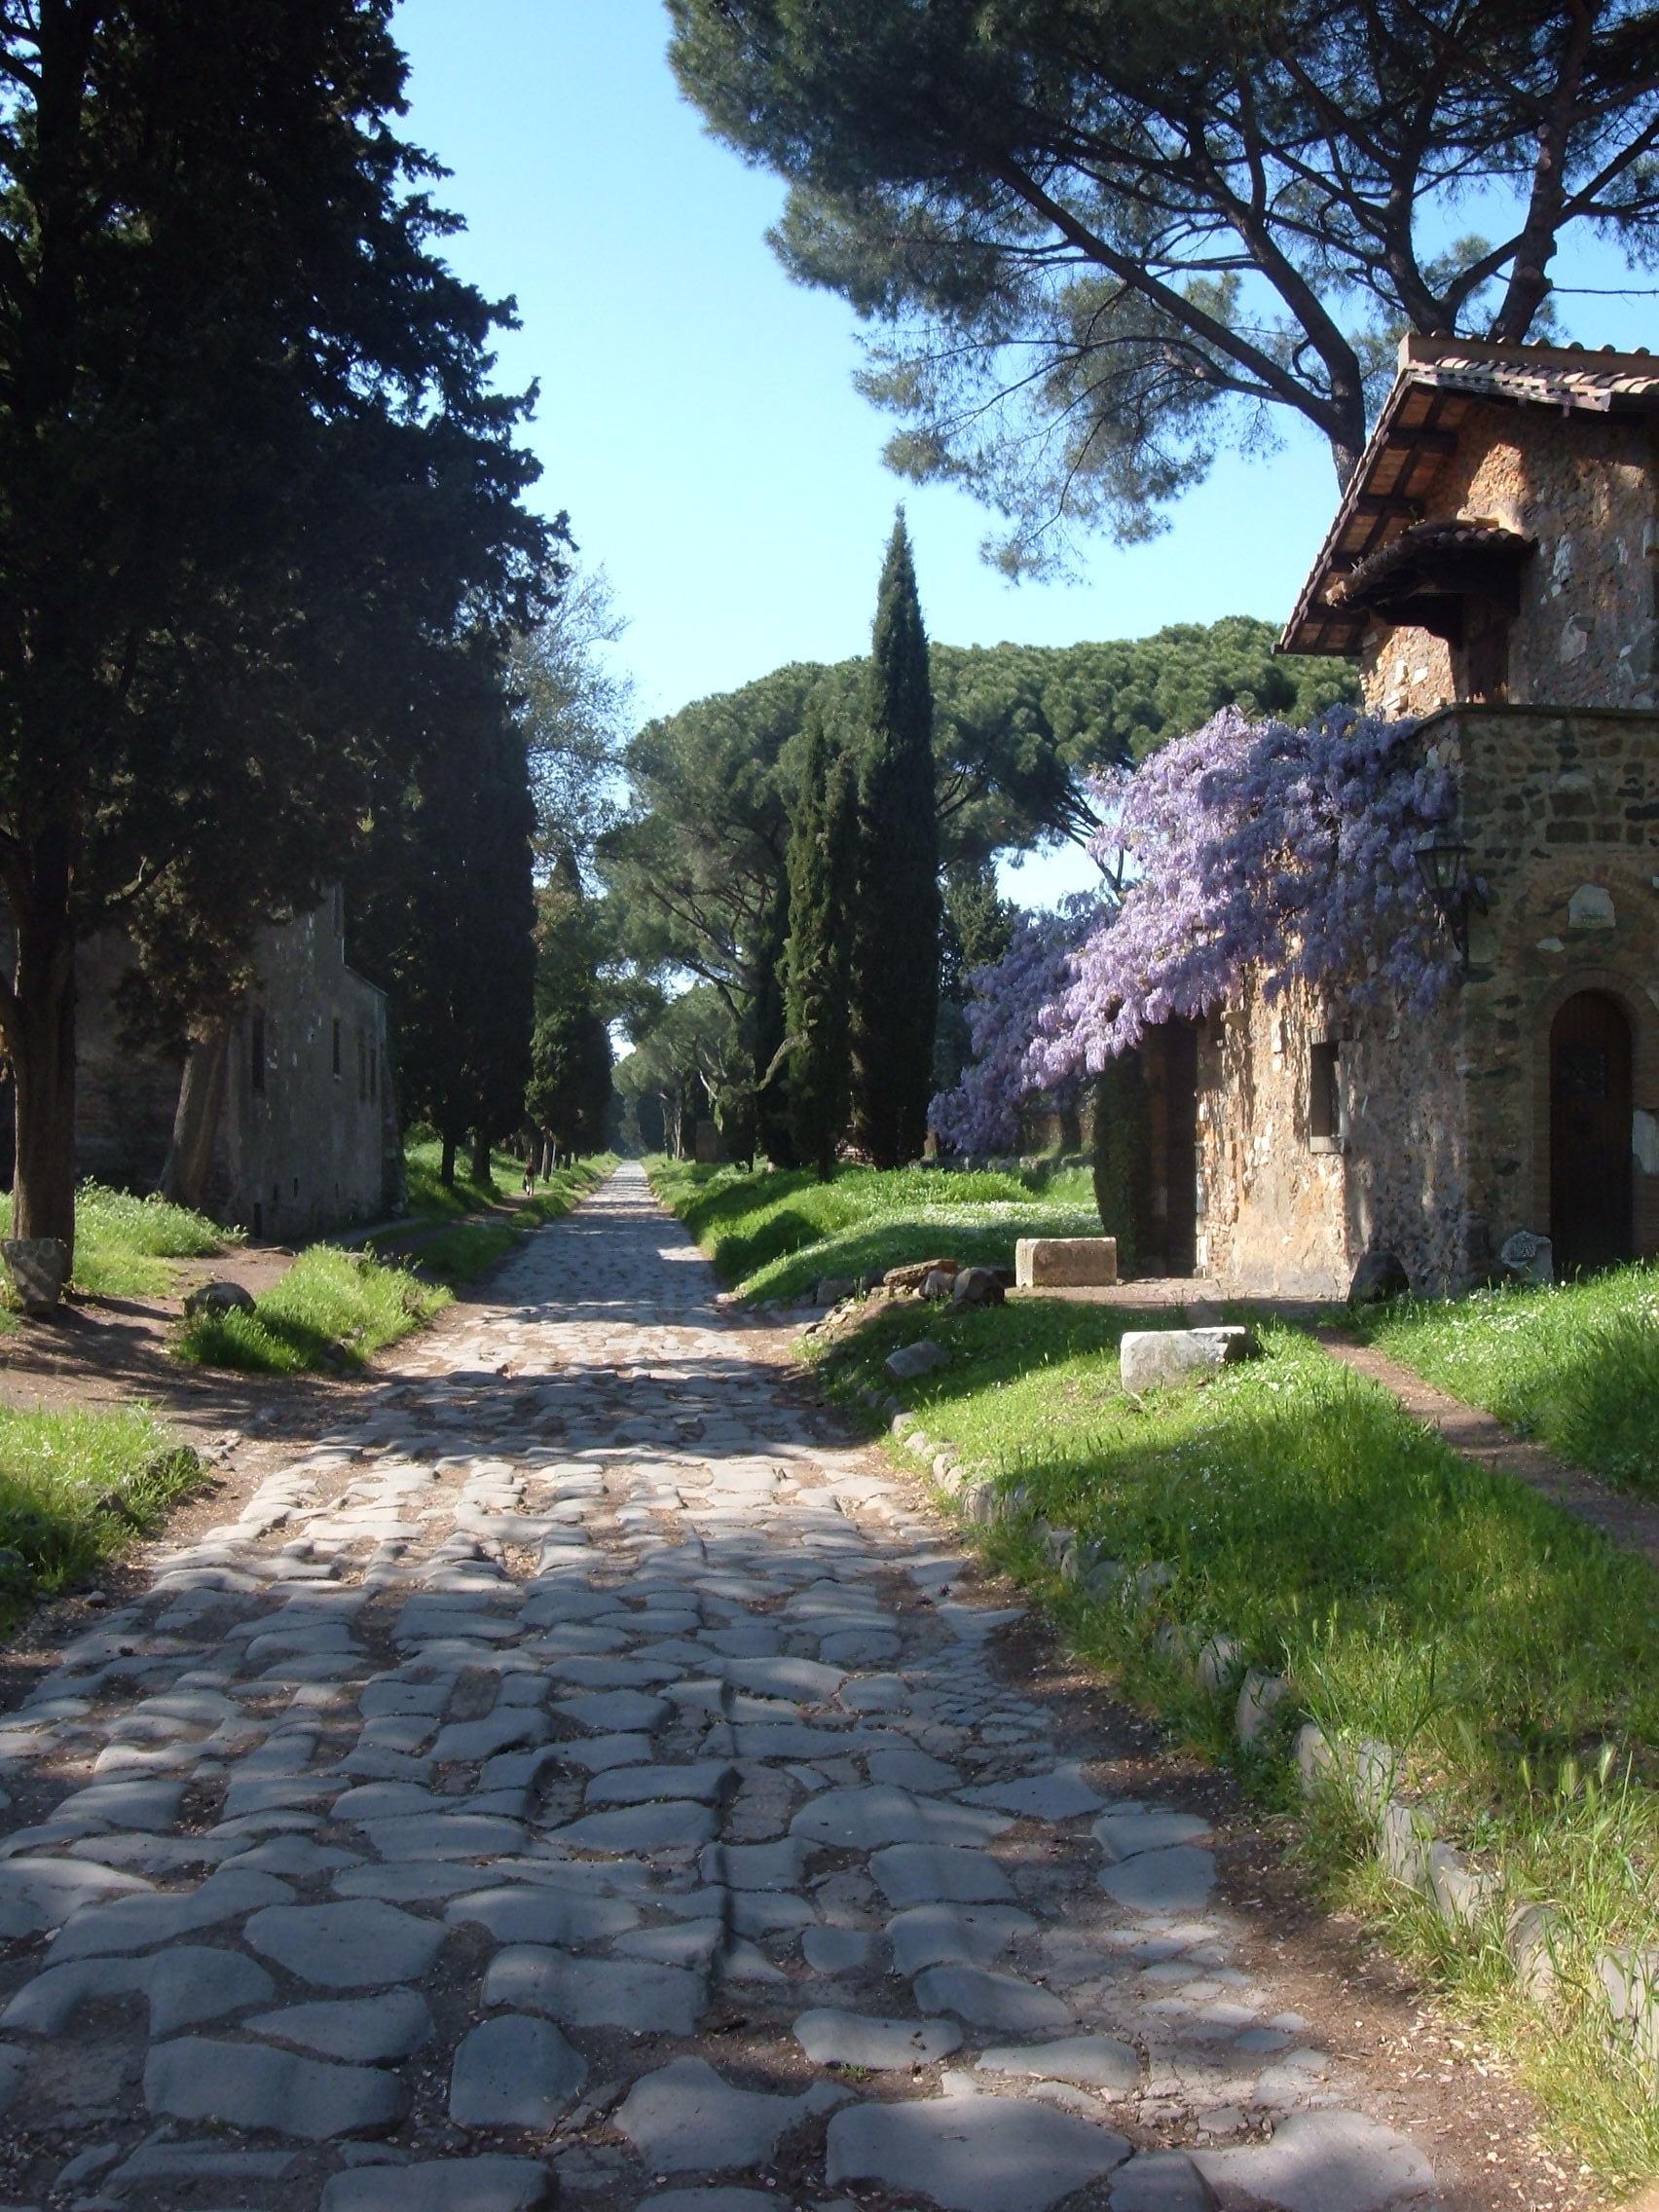 Římská silnice Via Appia